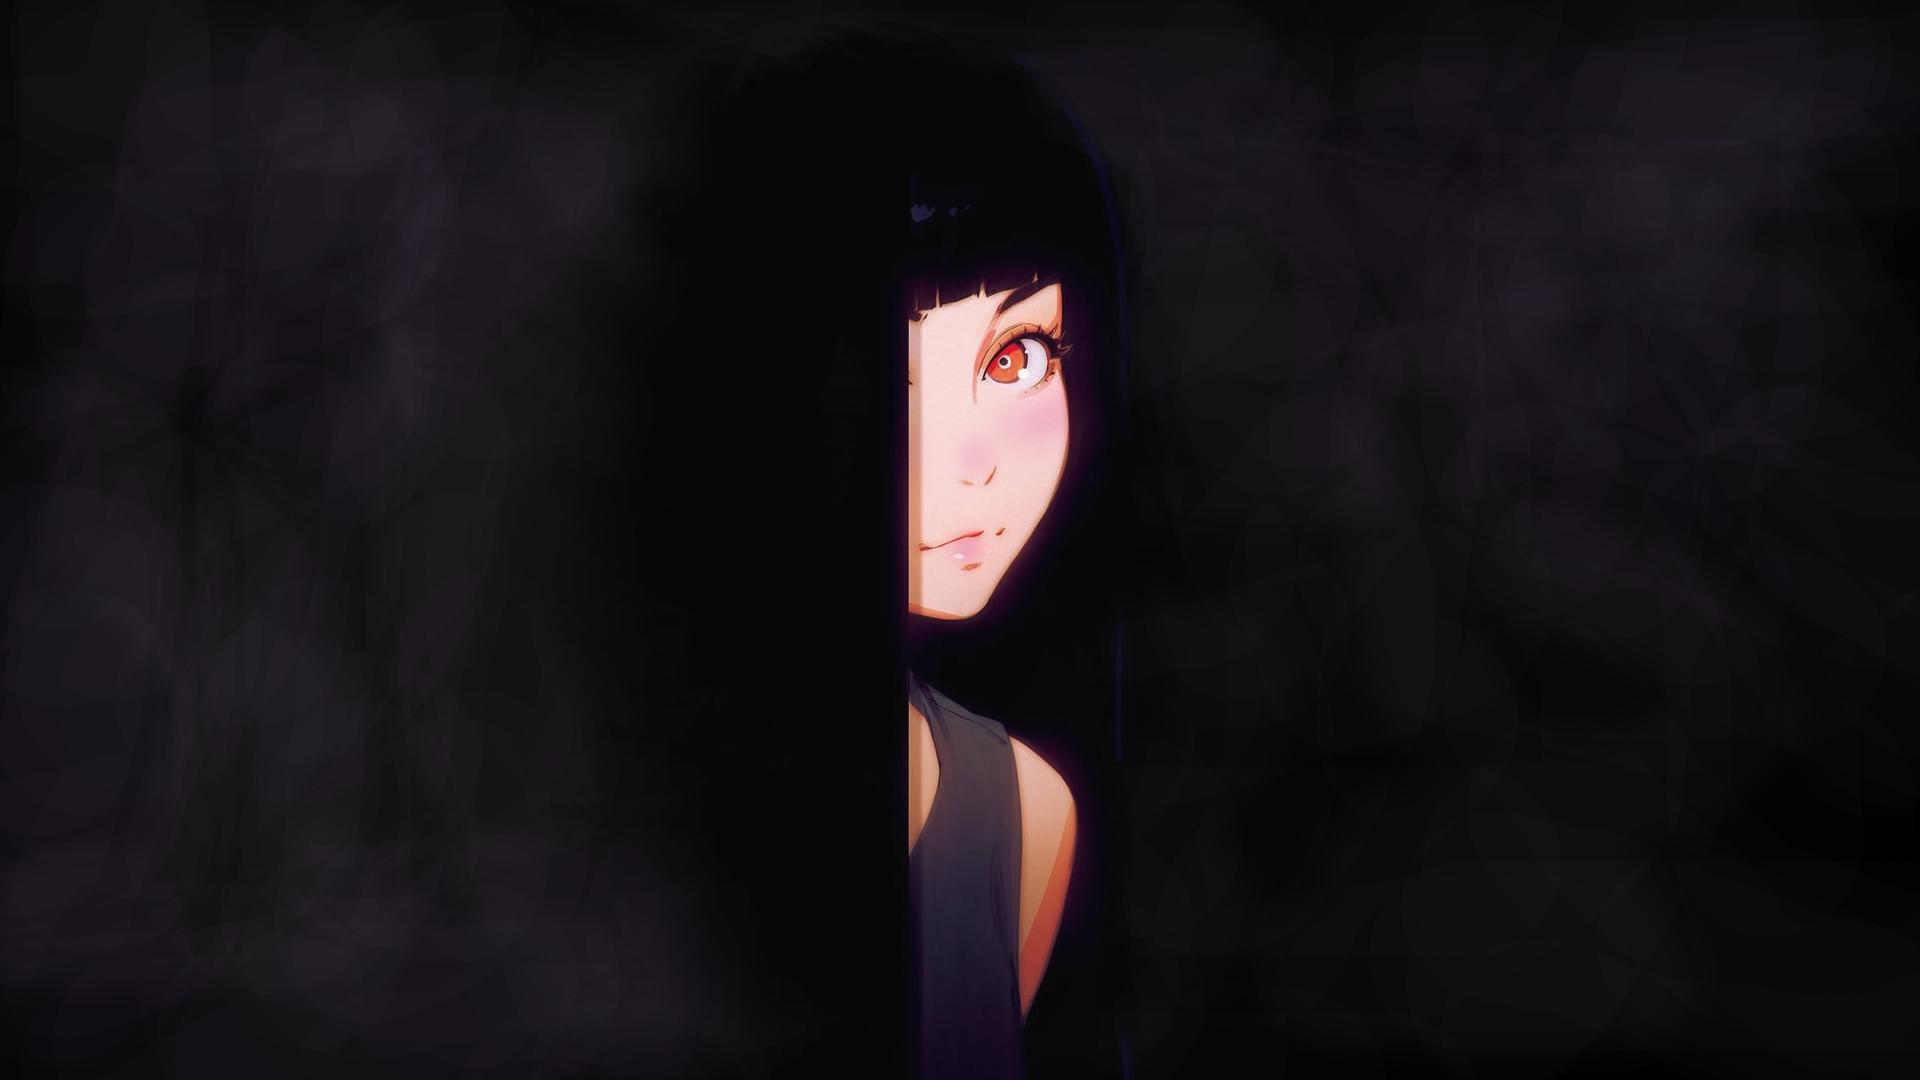 Anime 1920x1080 digital art anime girls fantasy art artwork original characters minimalism Ilya Kuvshinov イリヤ